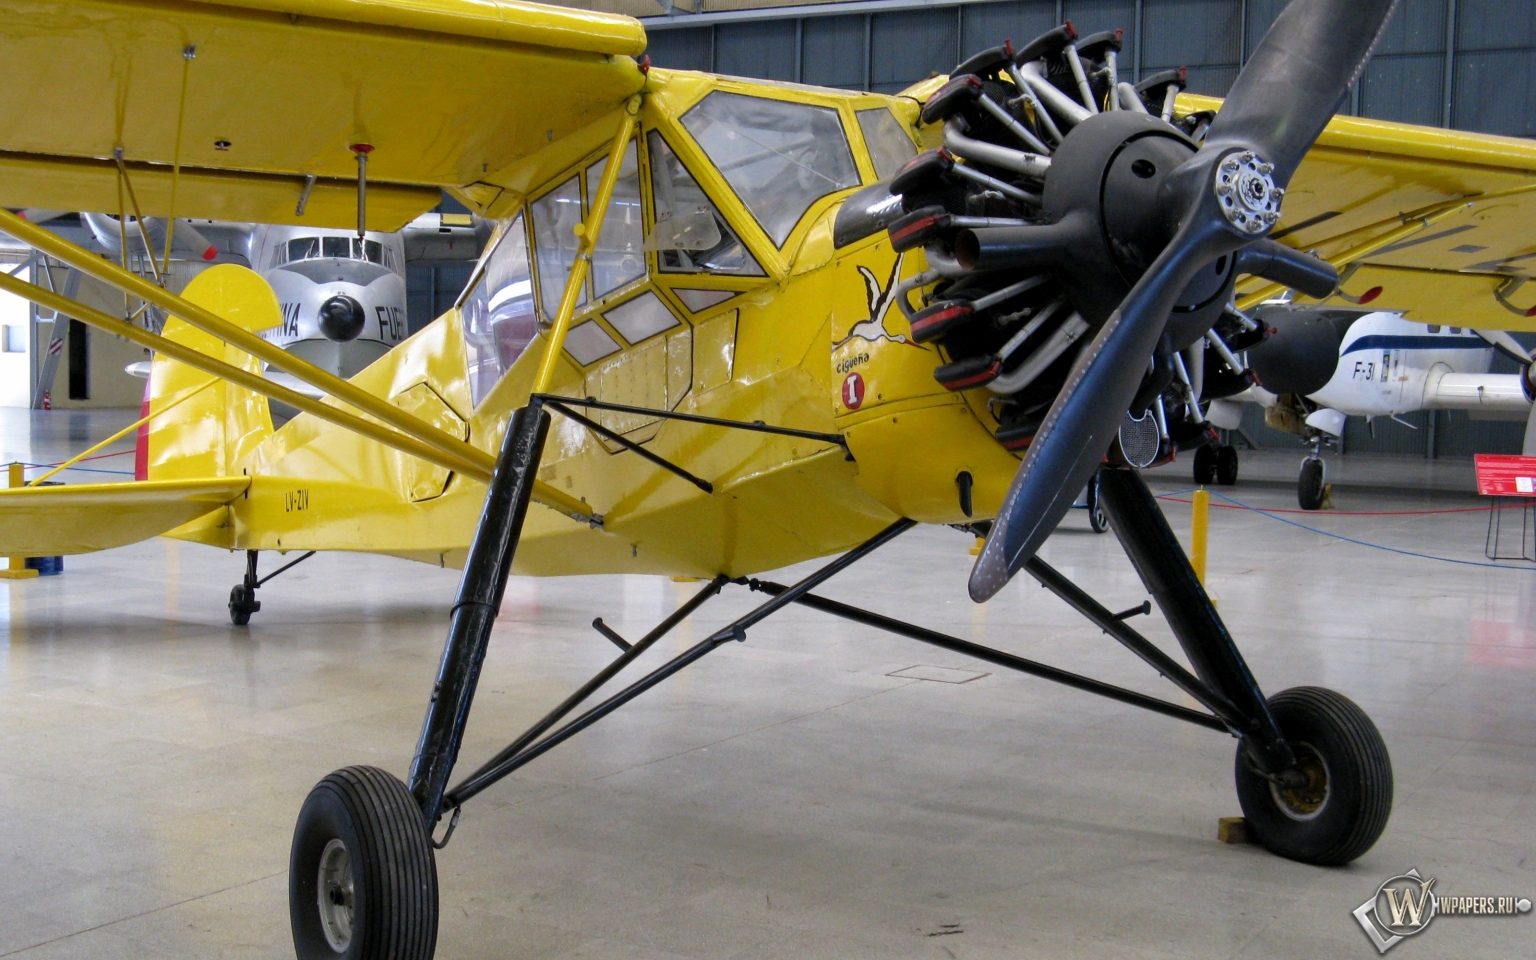 Fieseler Storch Fi-156 1536x960